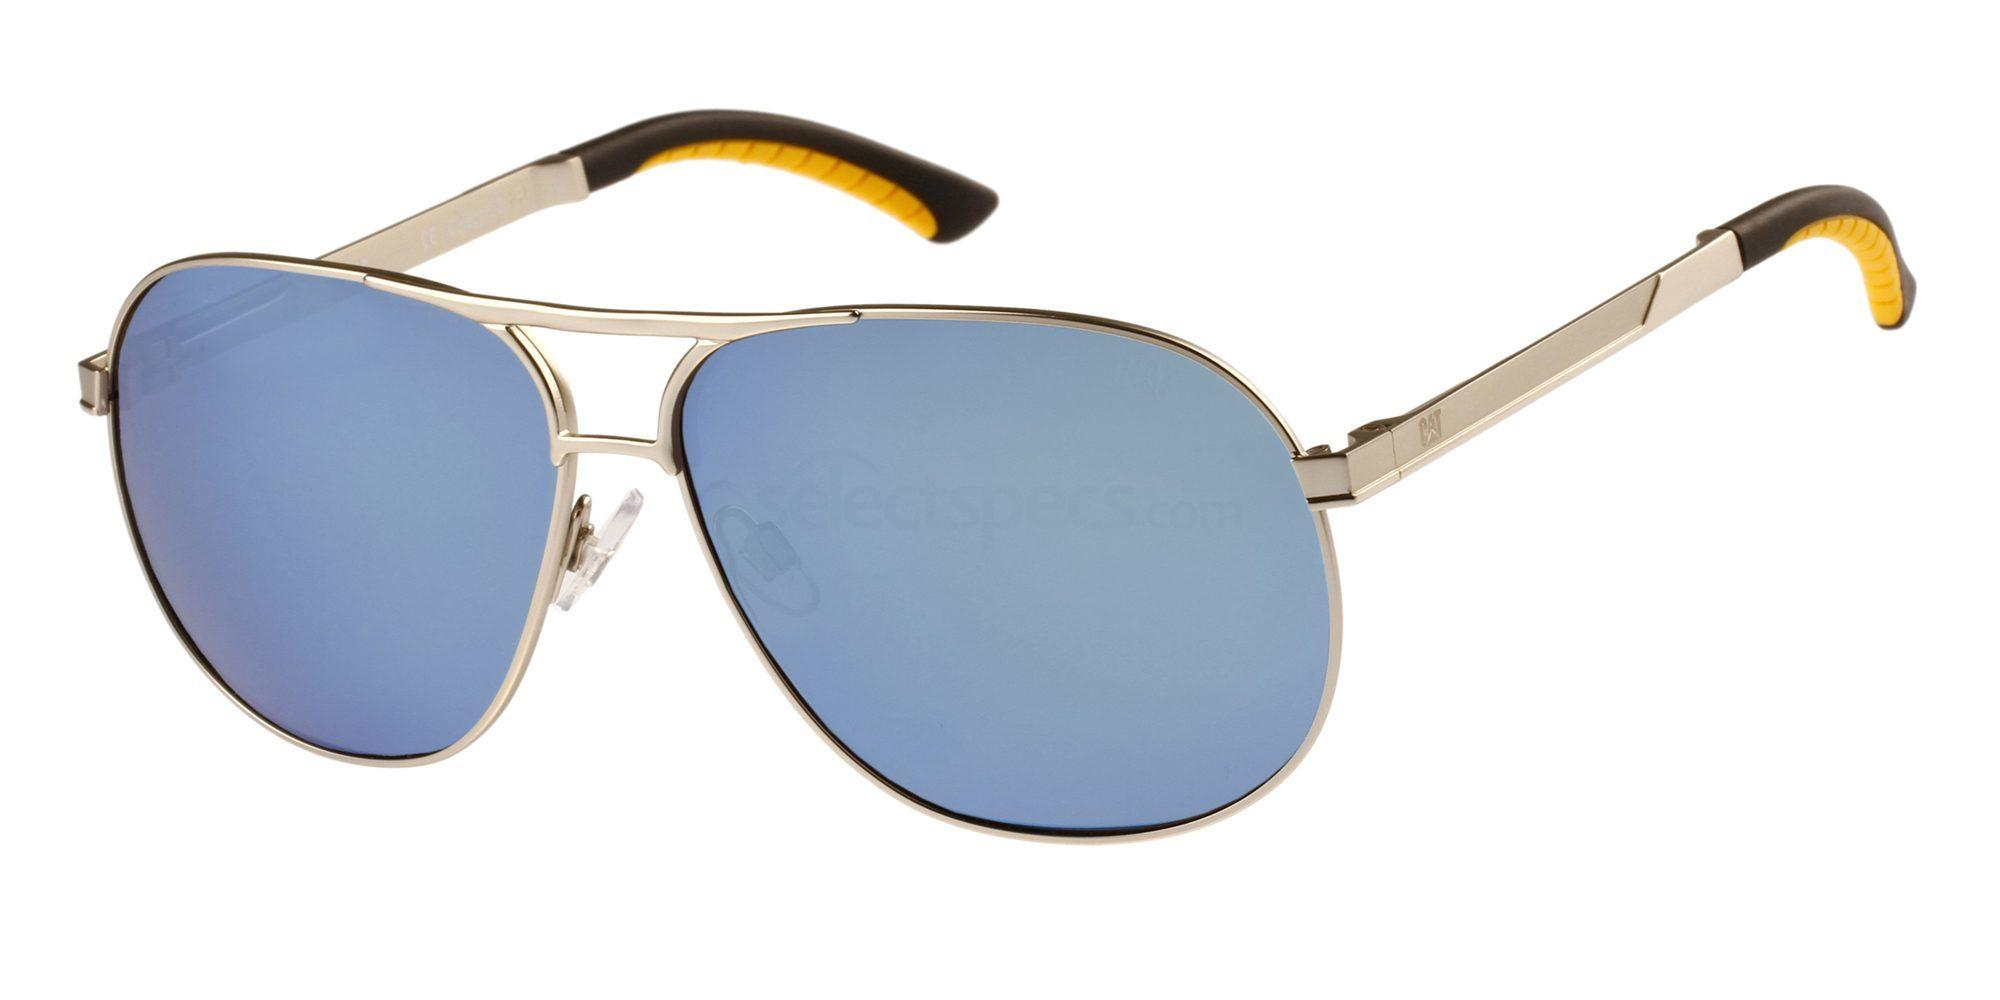 002P CTS-1505-P Sunglasses, CAT